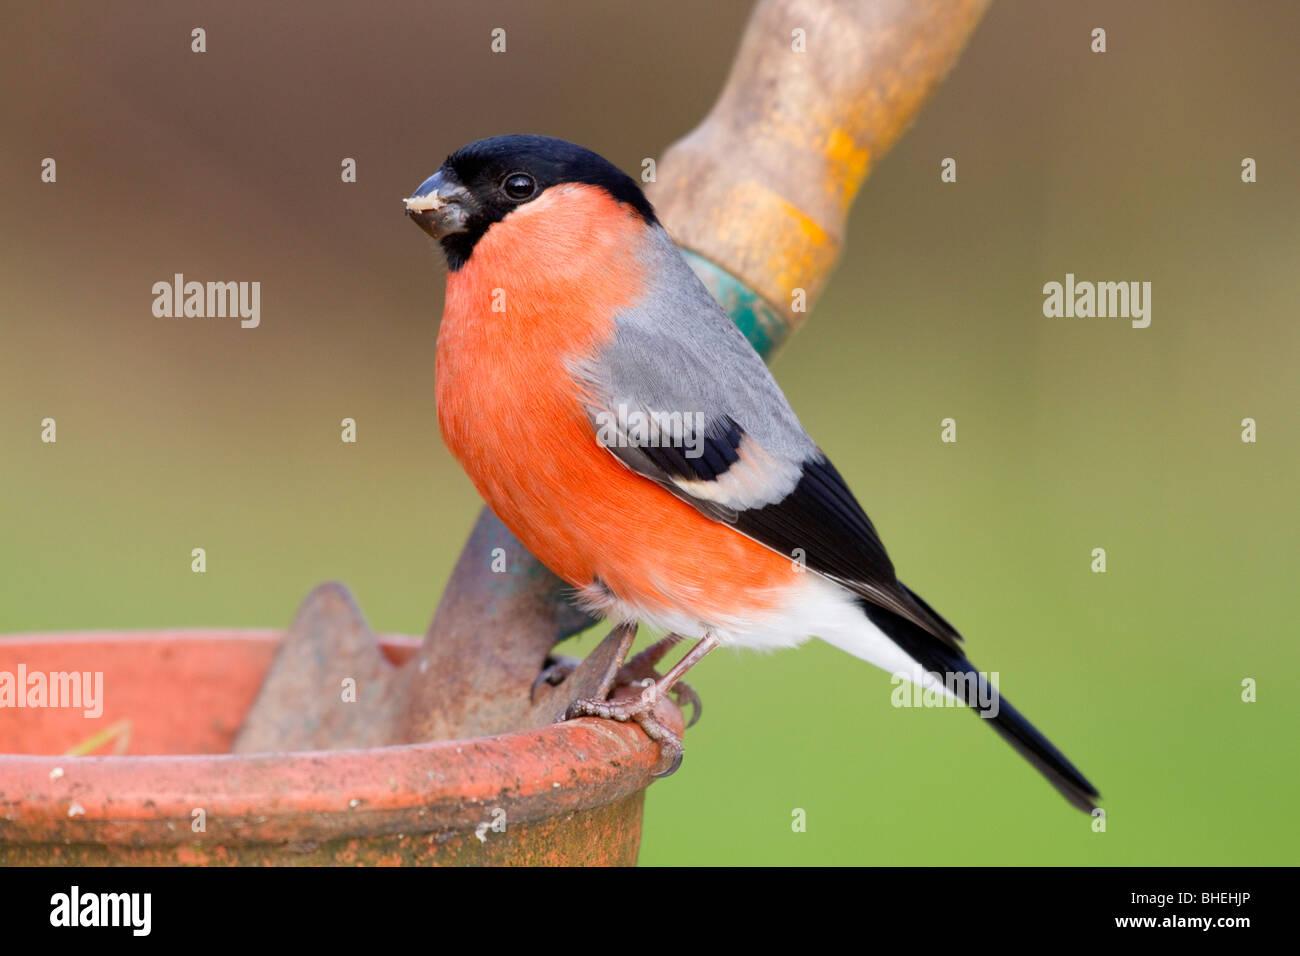 Bullfinch; Pyrrhula pyrrhula; male; on plant pot - Stock Image